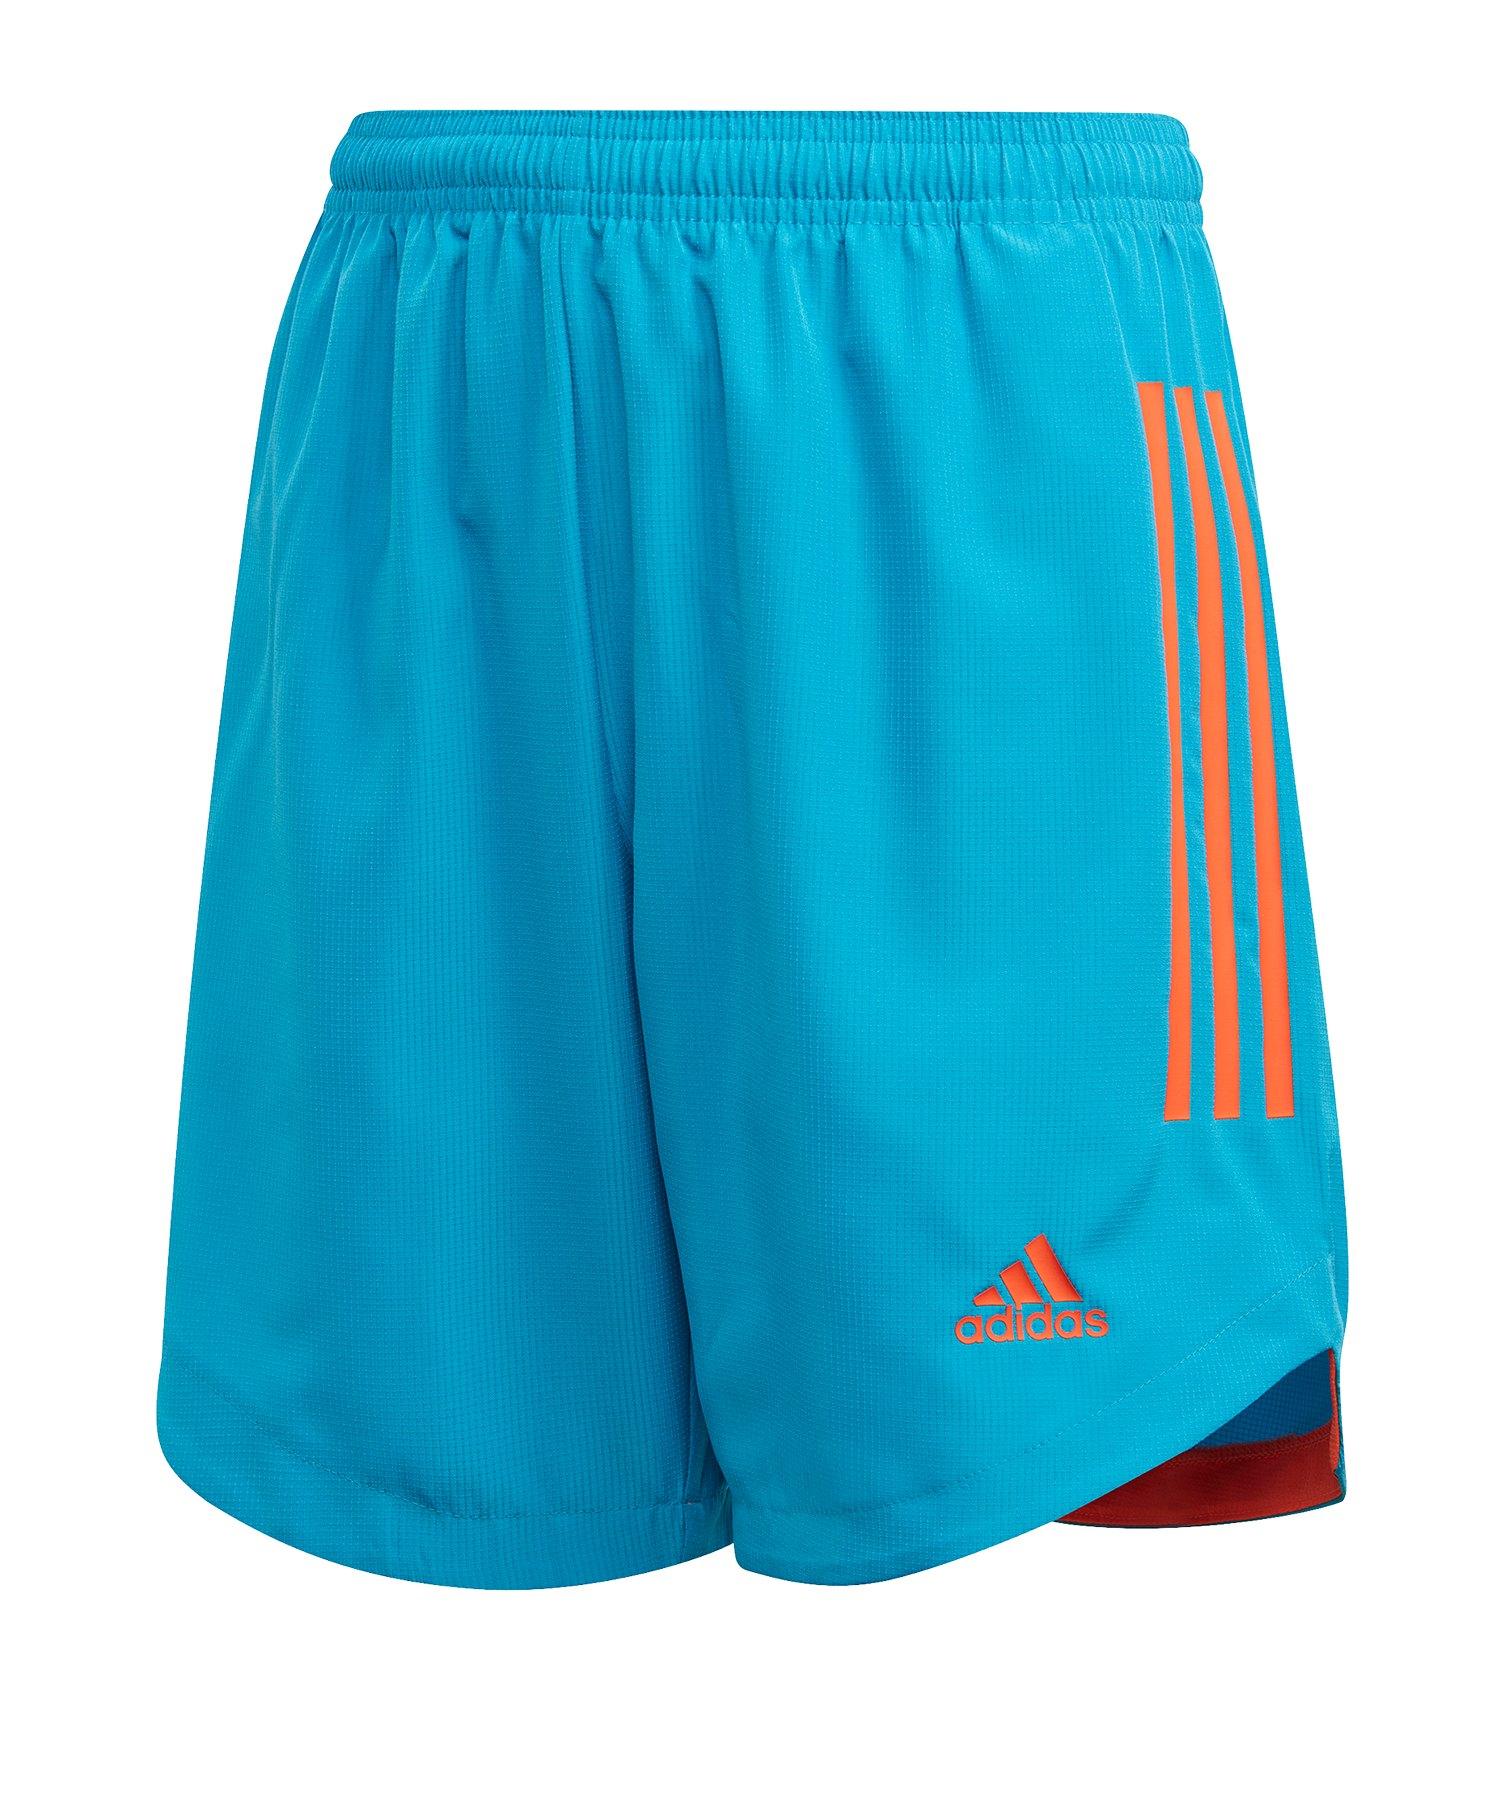 adidas Condivo 20 Short Kids Blau Orange - blau